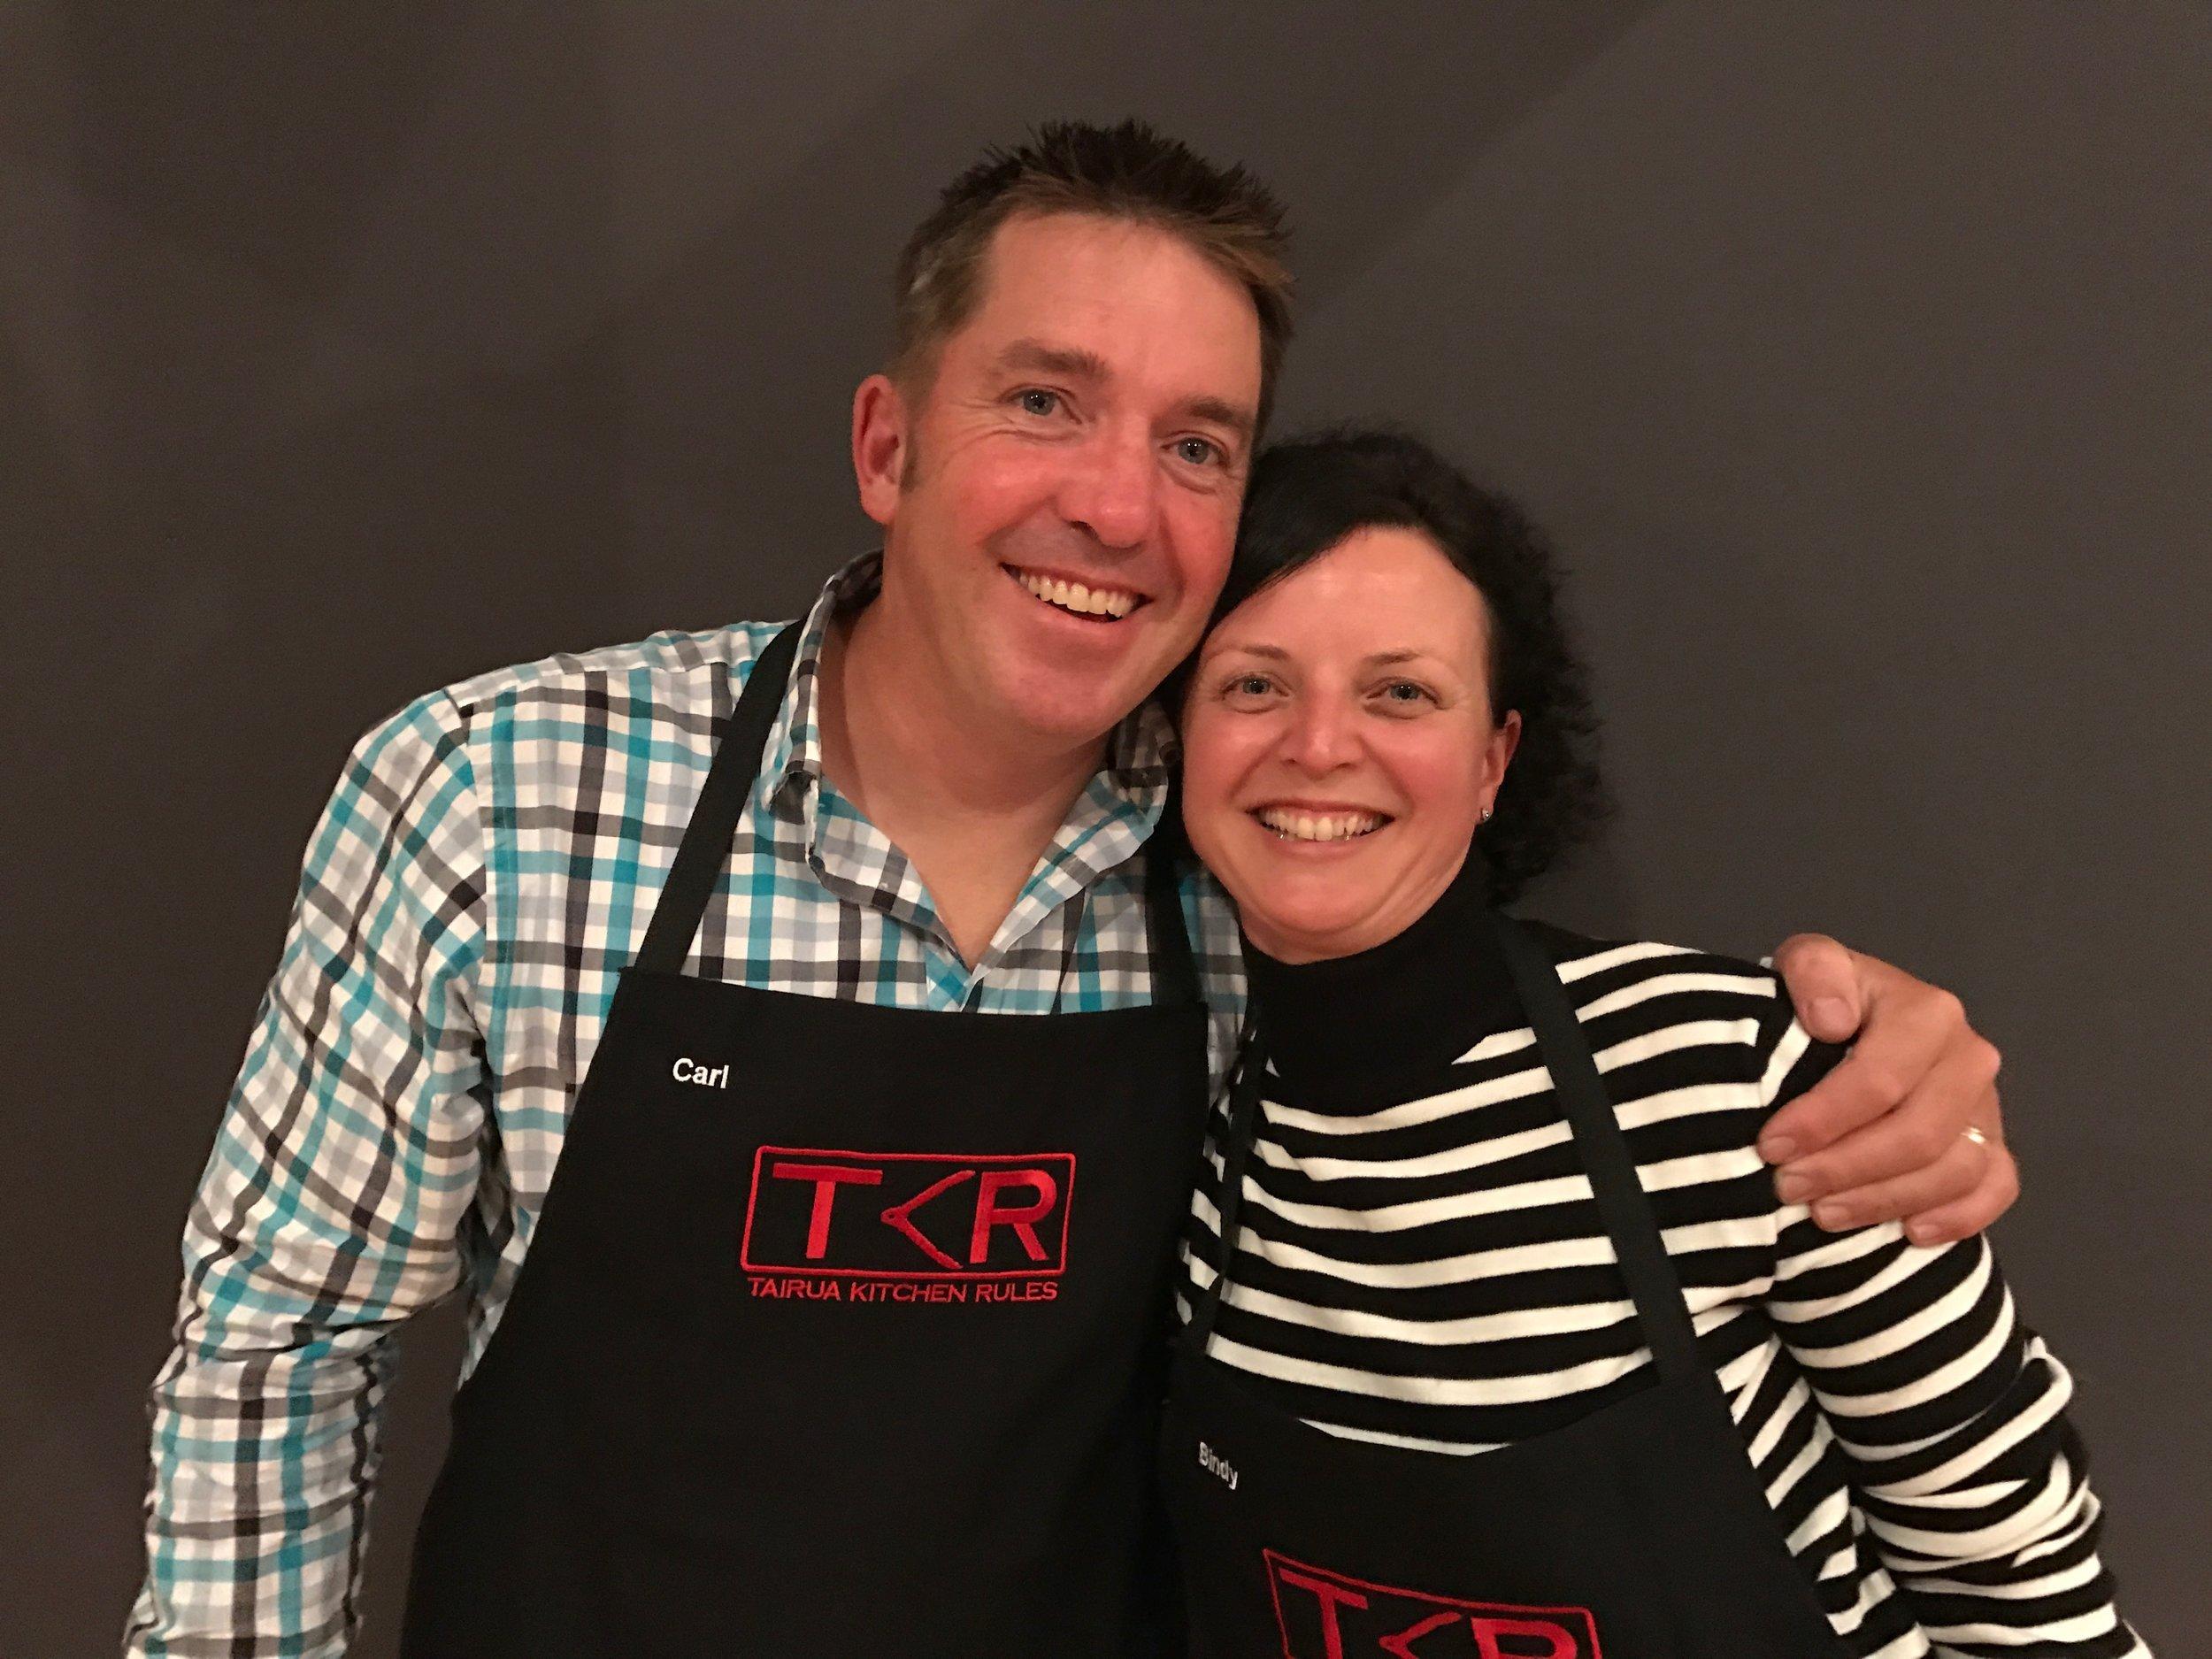 A bit of local fun! Tairua Kitchen Rules!!!